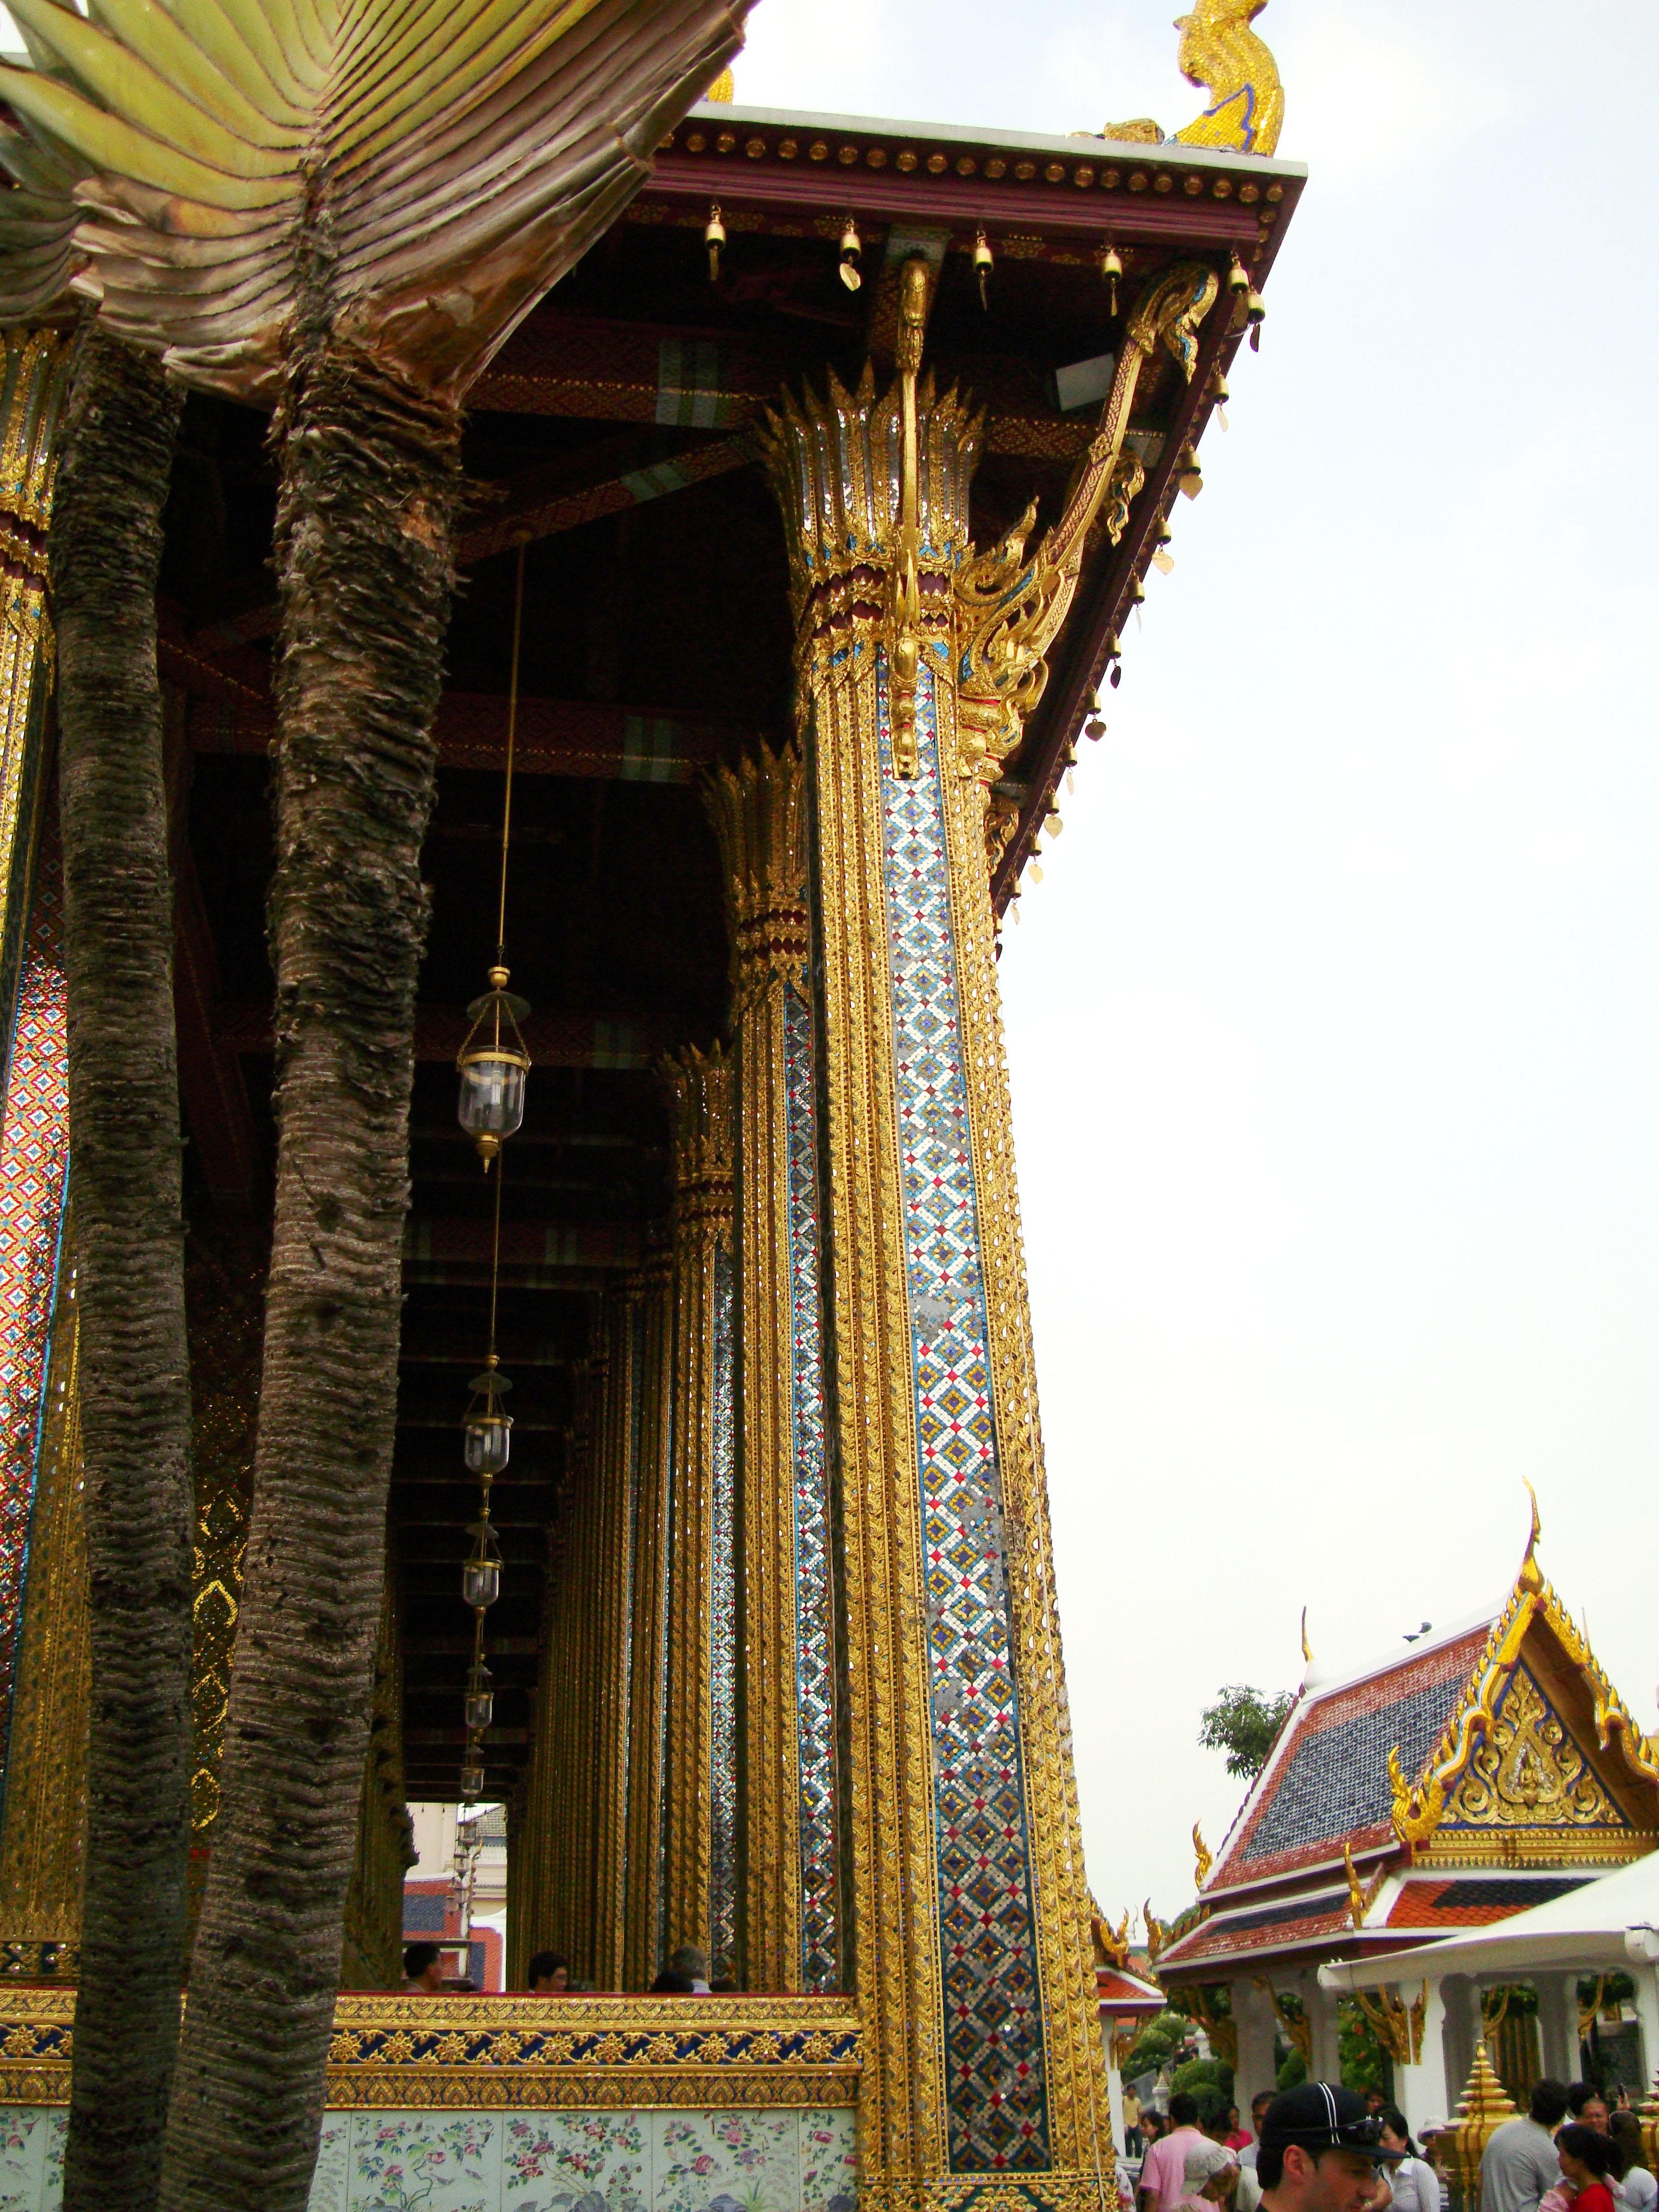 09 Prasat Phra Dhepbidorn intercrit designed walls and pillars Grand Palace 2010 01